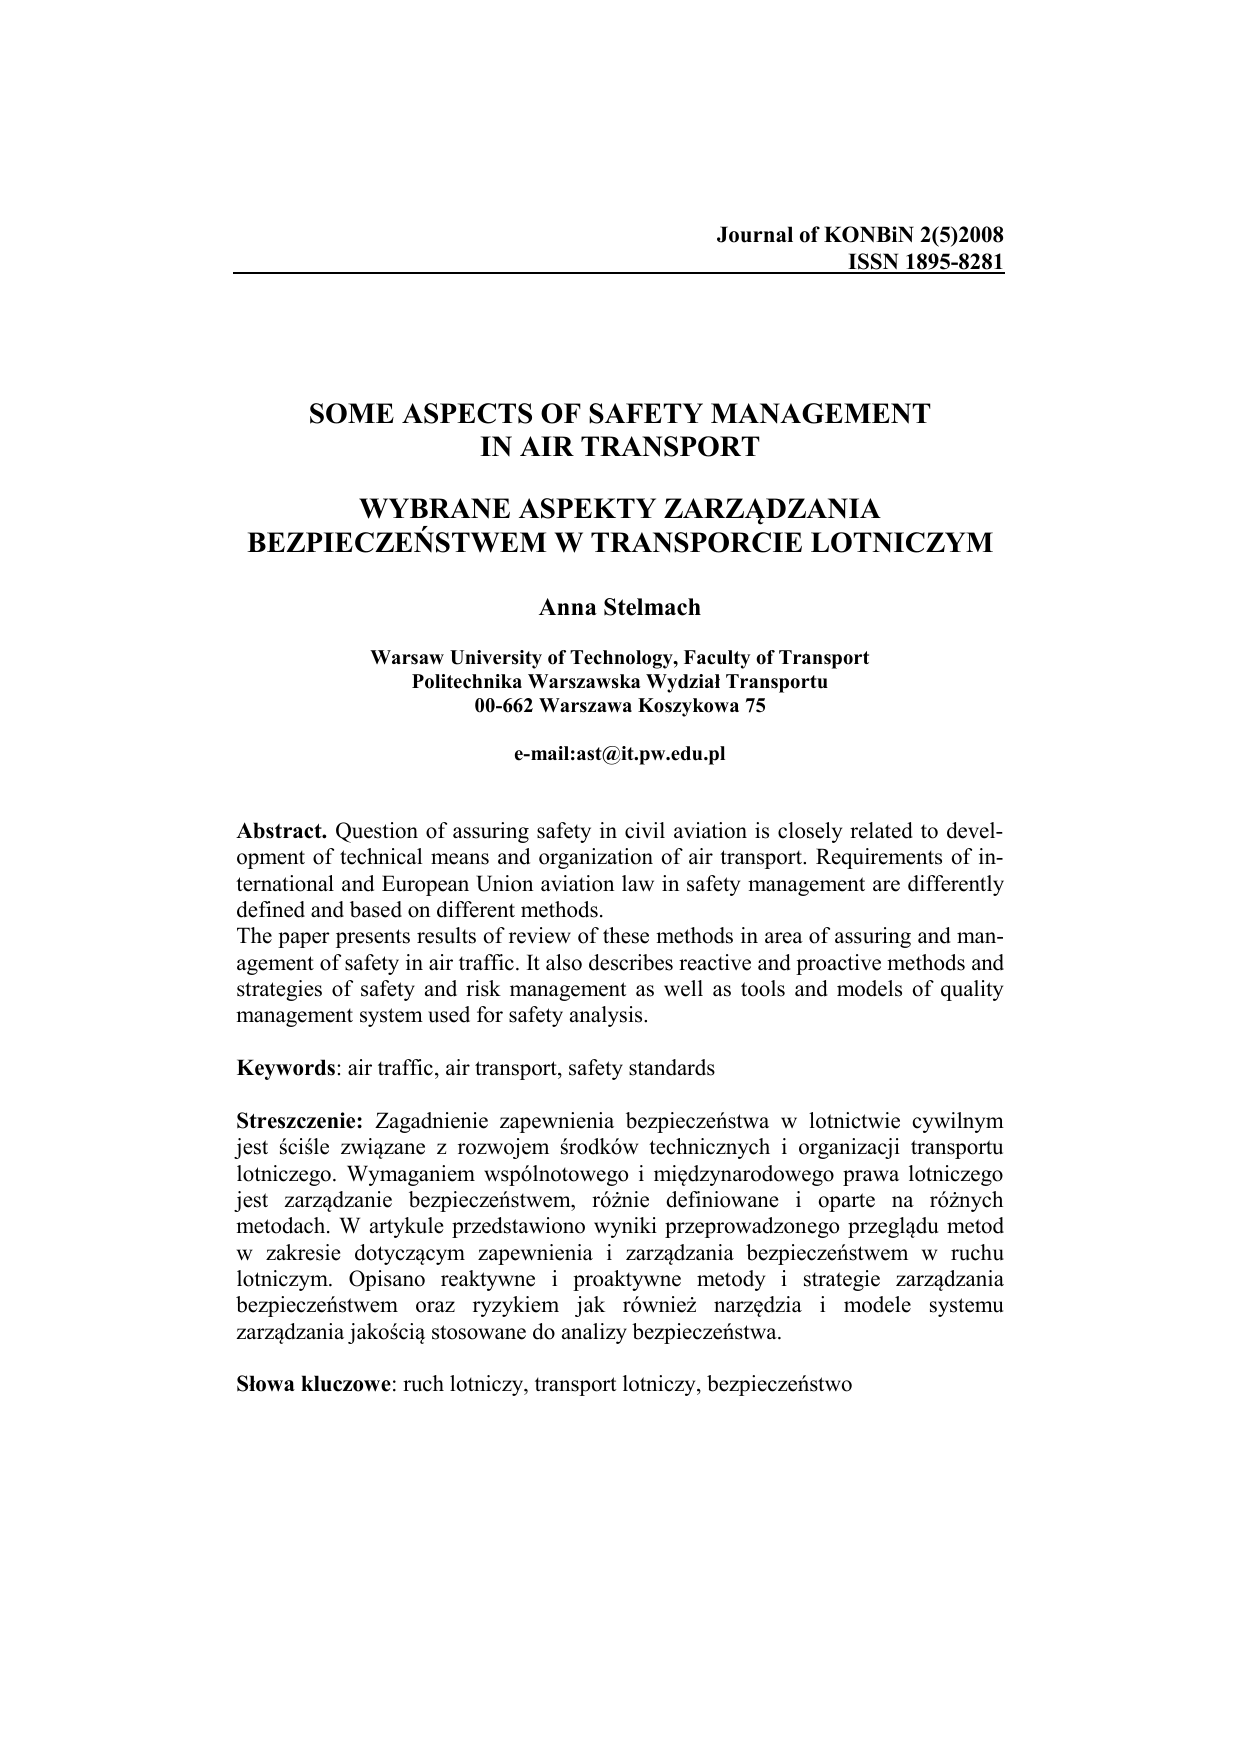 Journal of konbin manuscript printing instructions ccuart Choice Image